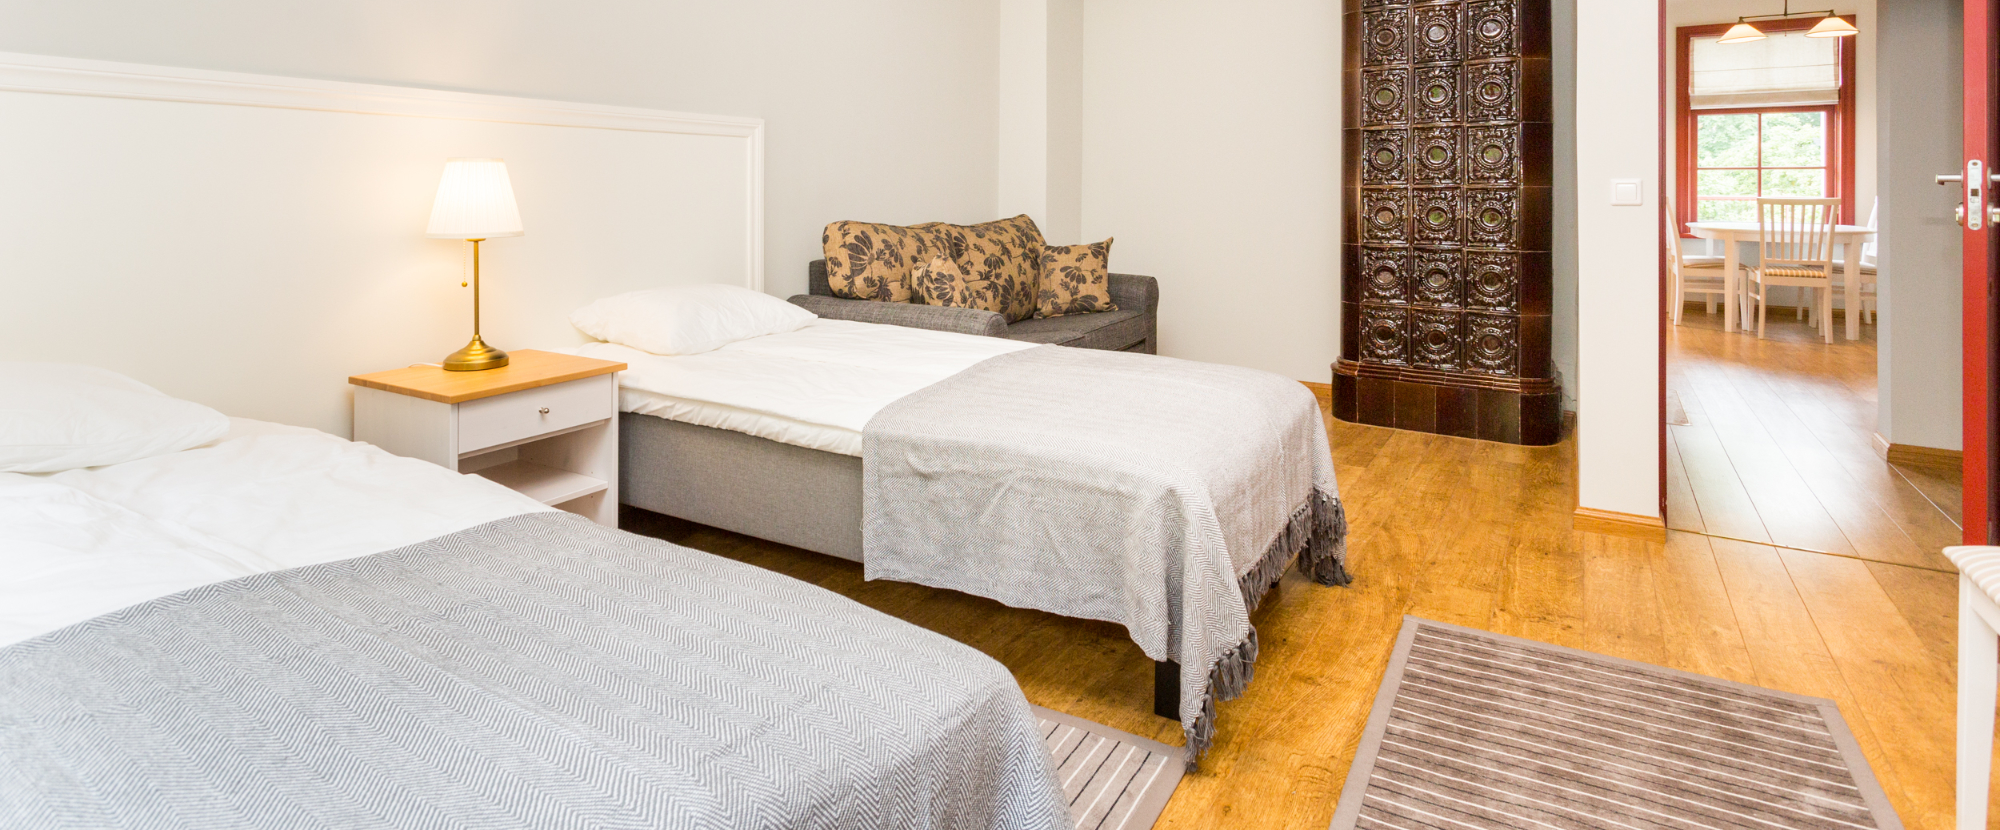 vabaduse-apartments-k3-magamistuba